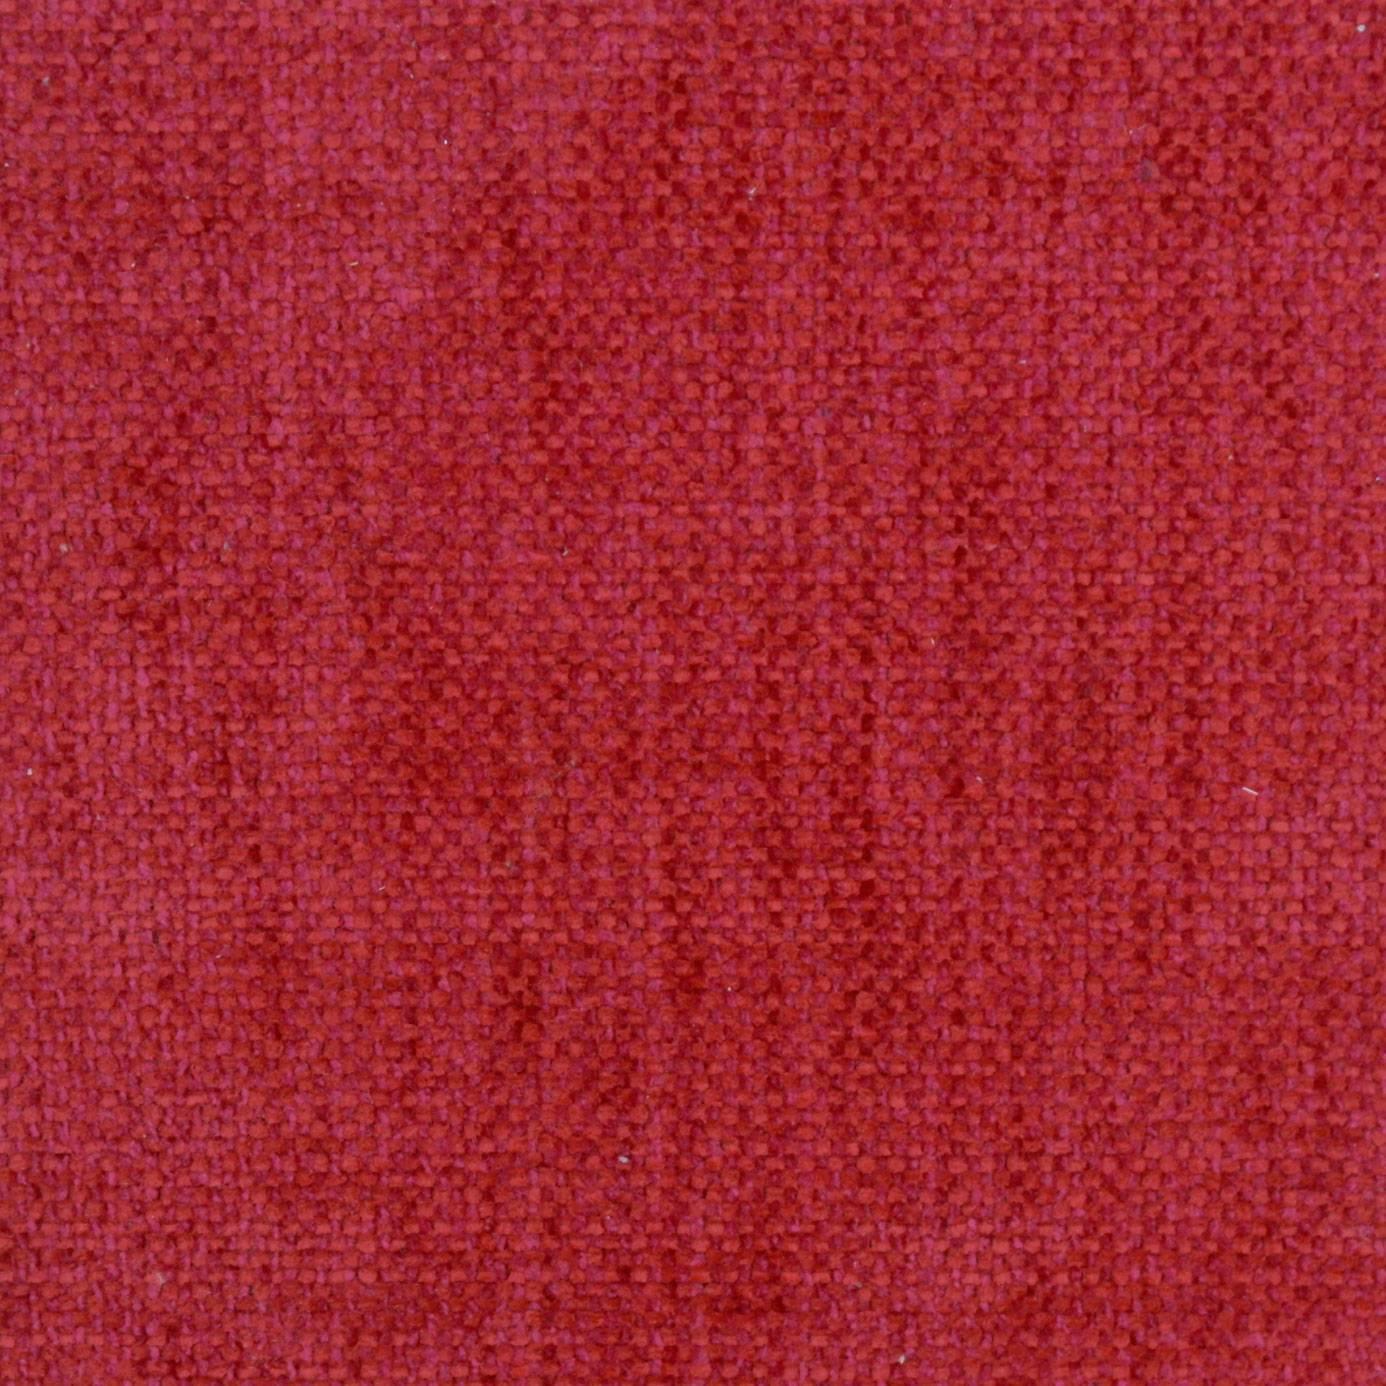 Marco Fabric - Raspberry (MARCORASPBERRY) - Warwick Marco Fabric ...